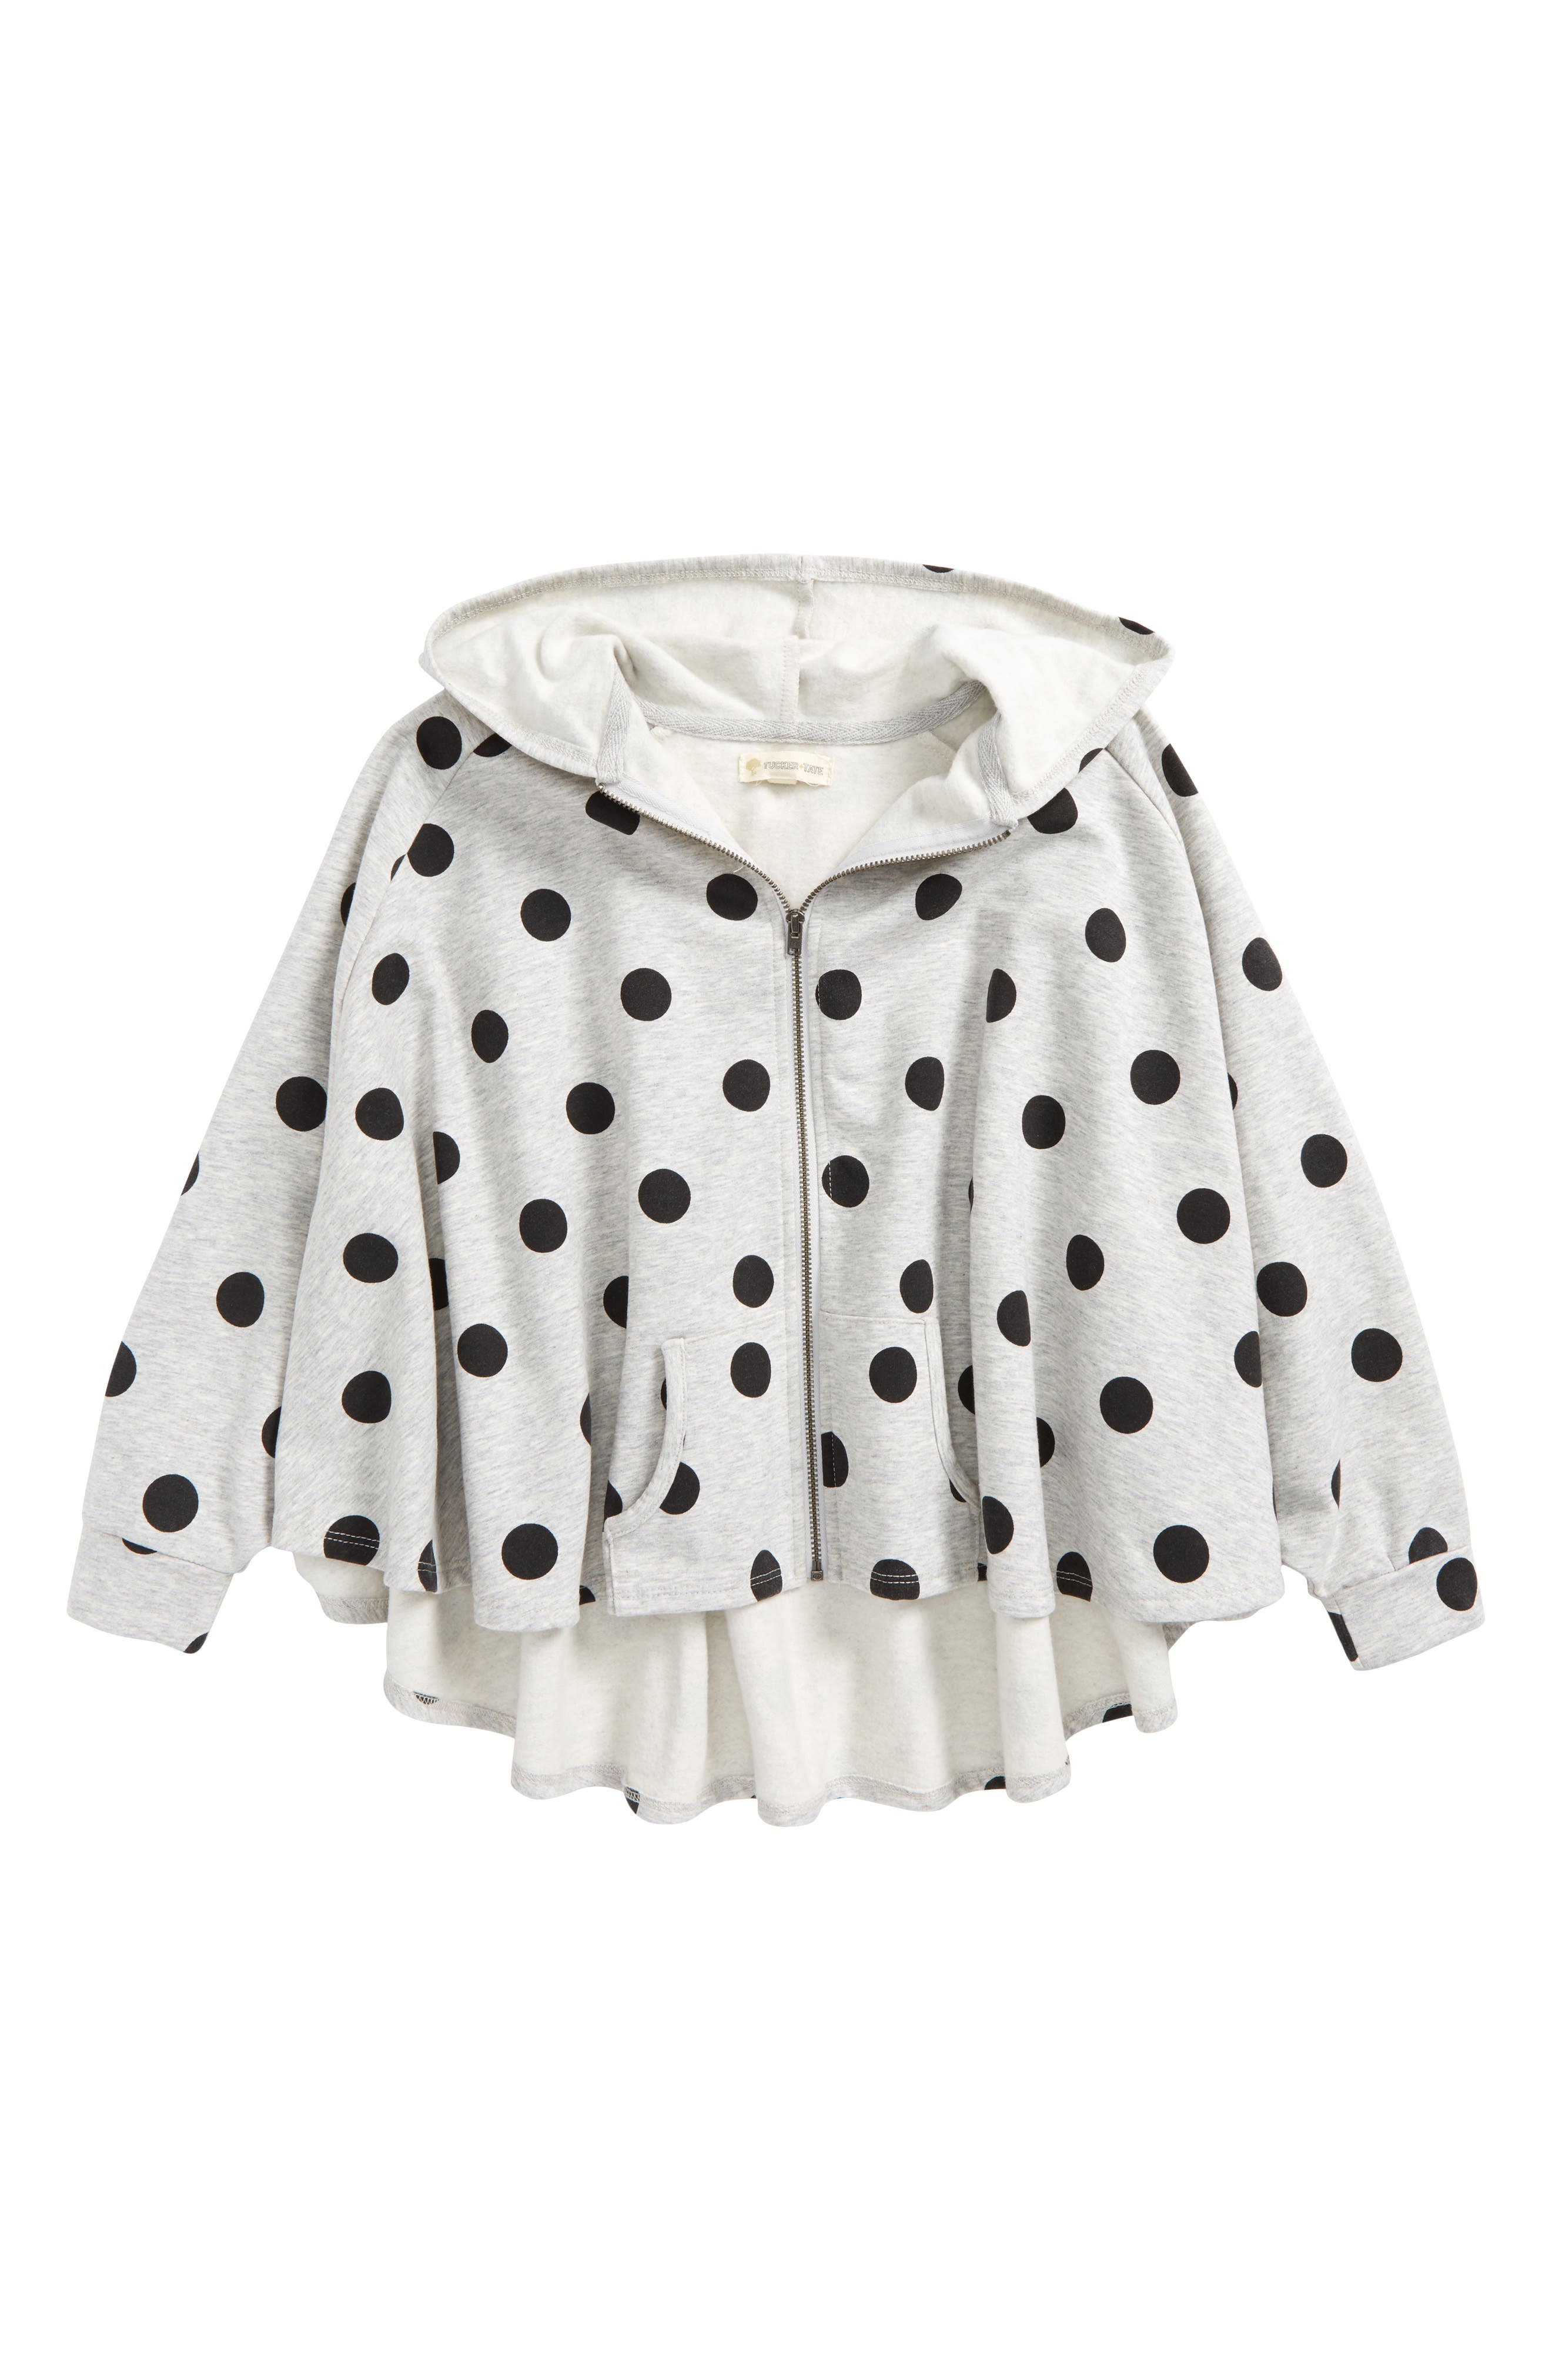 Polka Dot Hooded Cape,                         Main,                         color, Grey Ash Heather Girly Dot